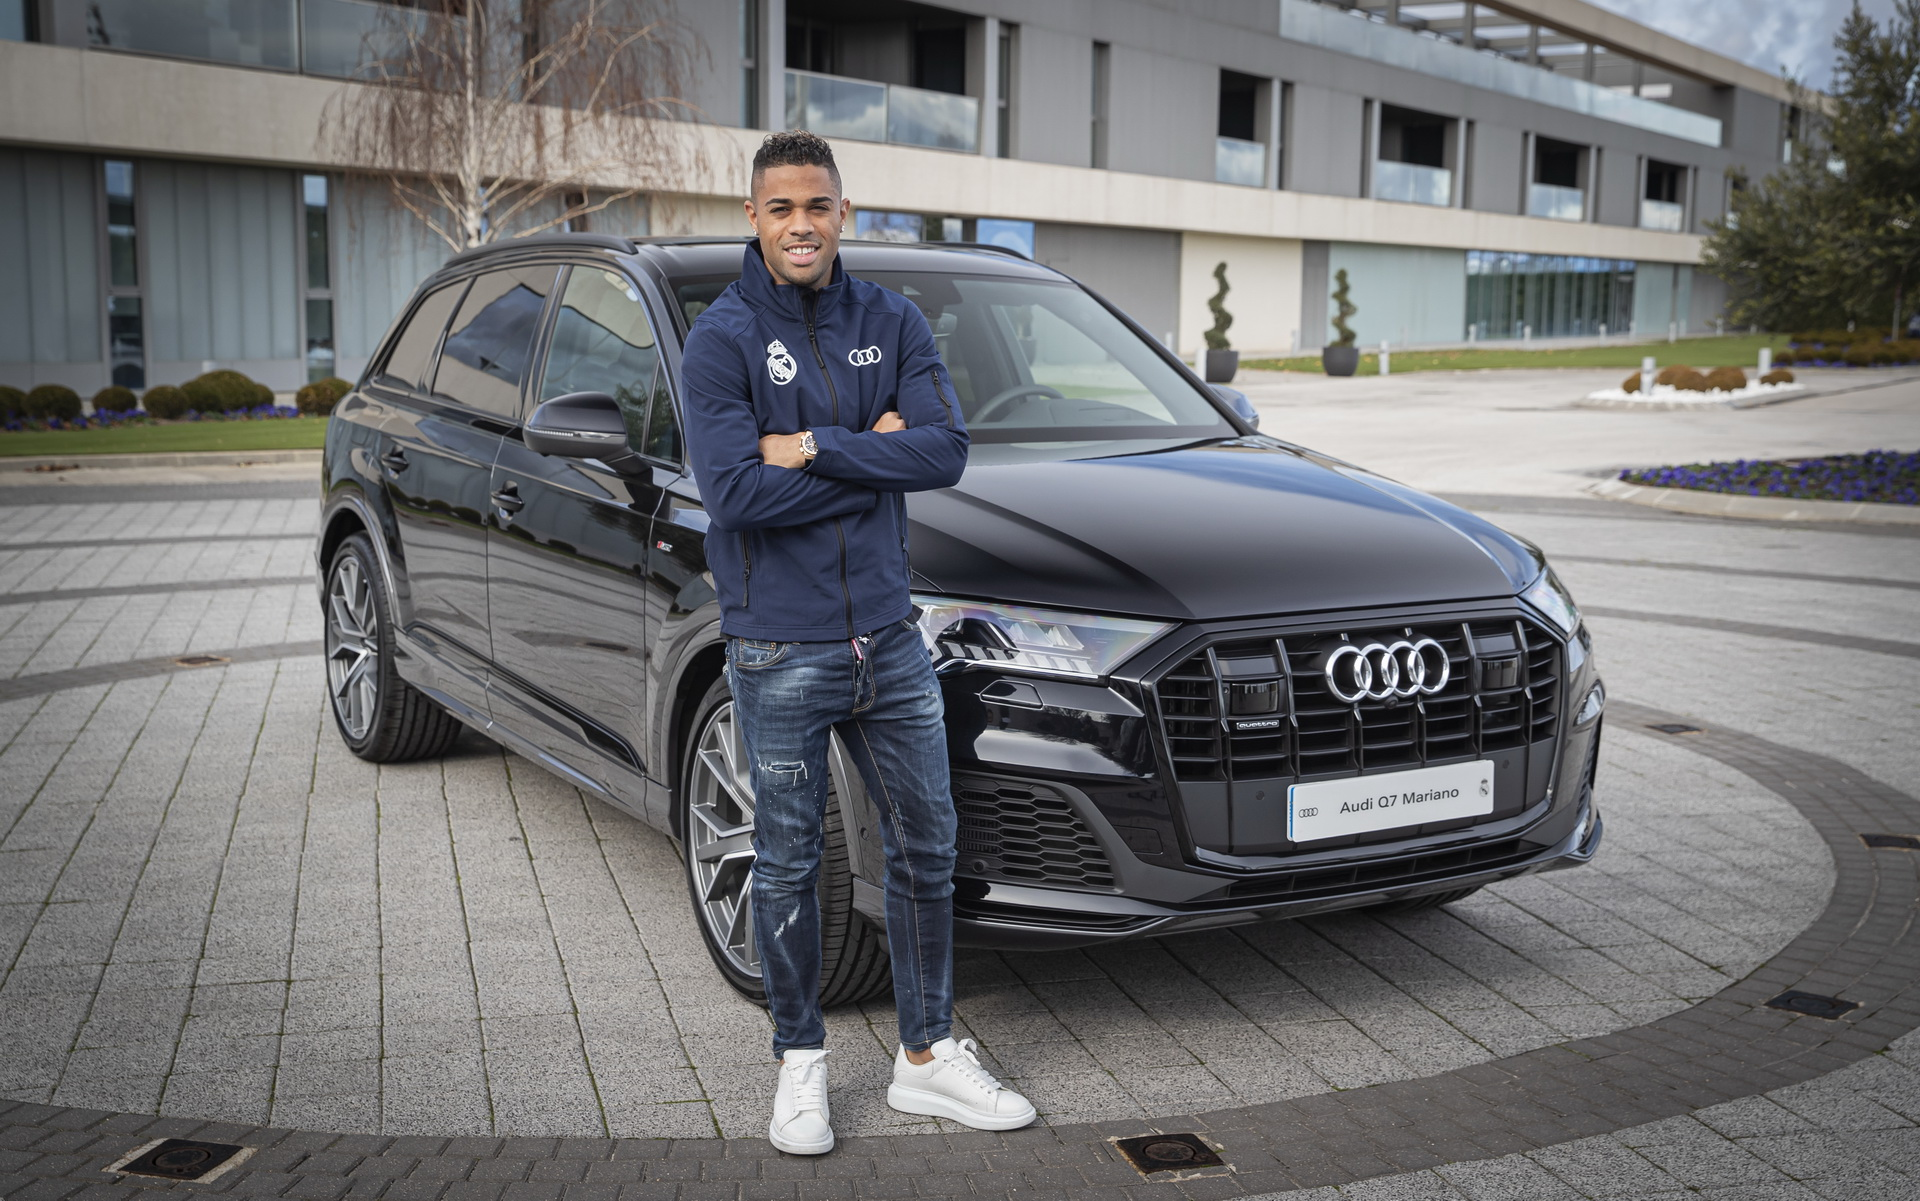 Real_Madrid_Players_Audi_0016